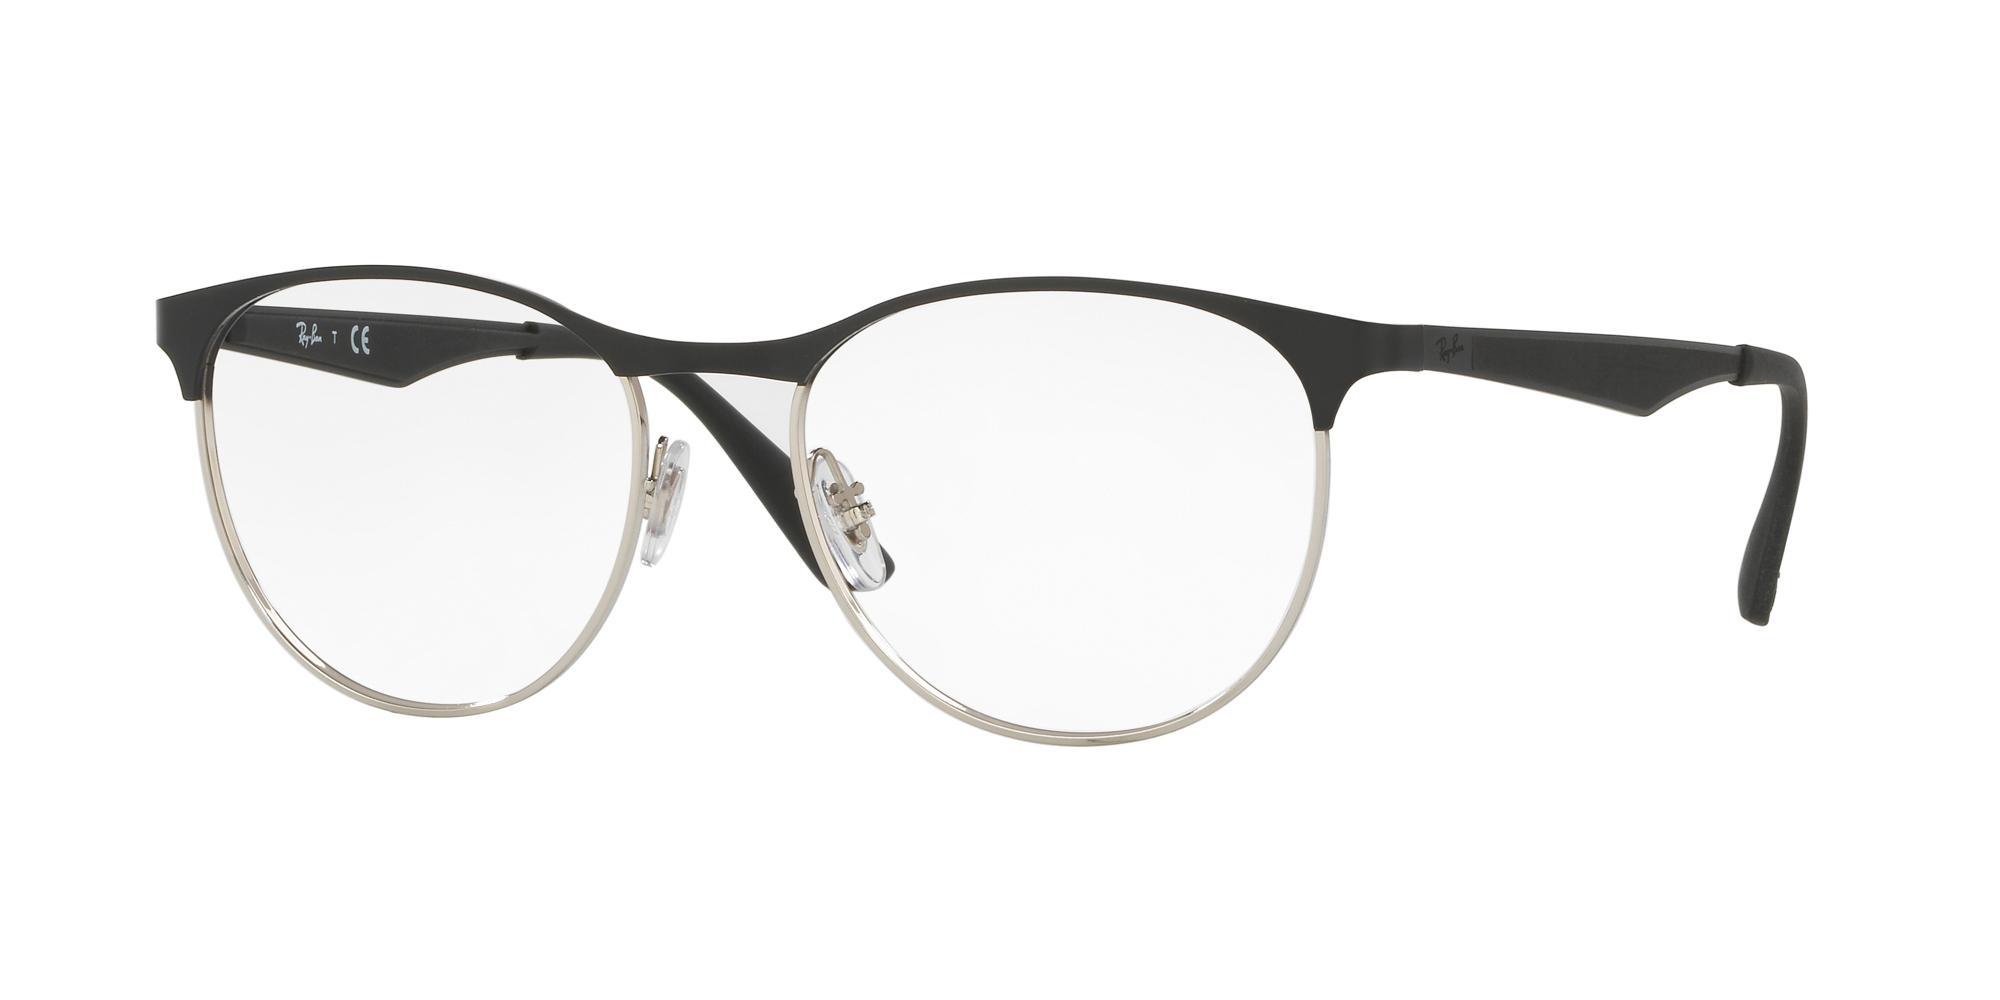 RAY BAN RB 6365 C.2531 SILVER/BRONZE 51-17-145 Rx Eyeglass